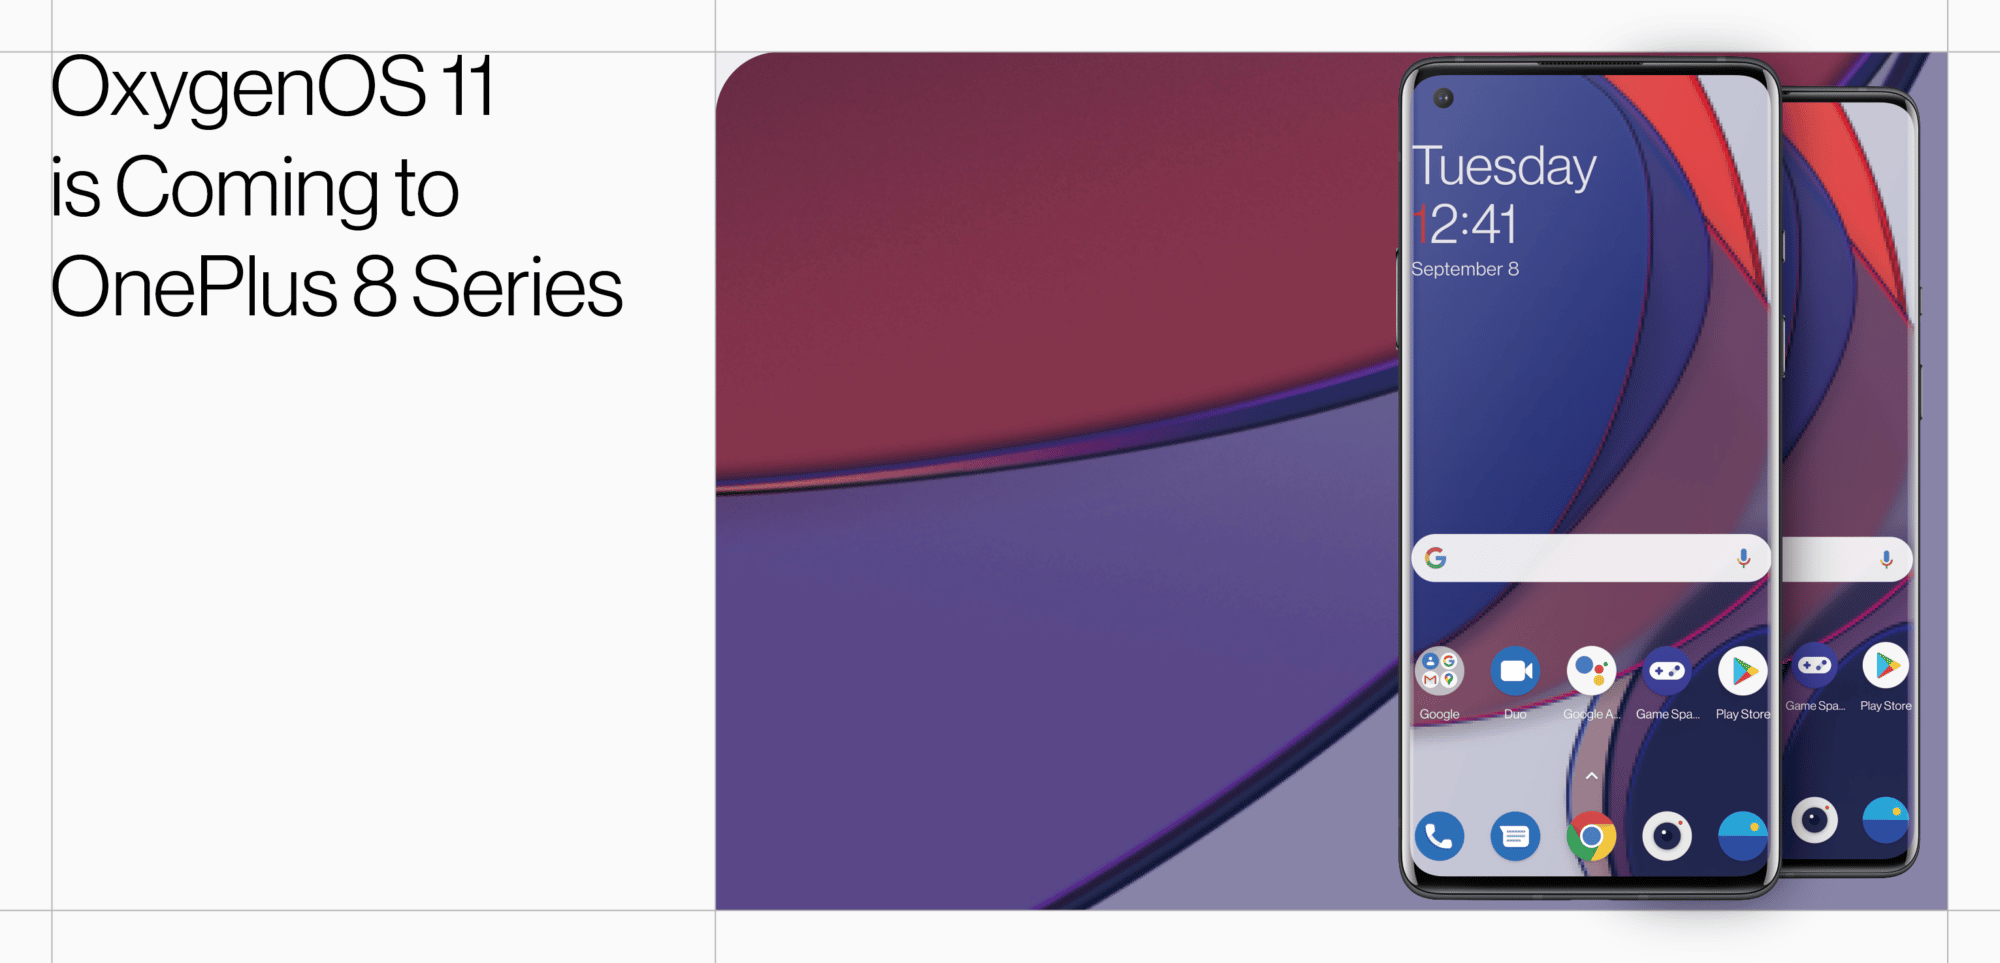 OxygenOS 11 series OnePlus